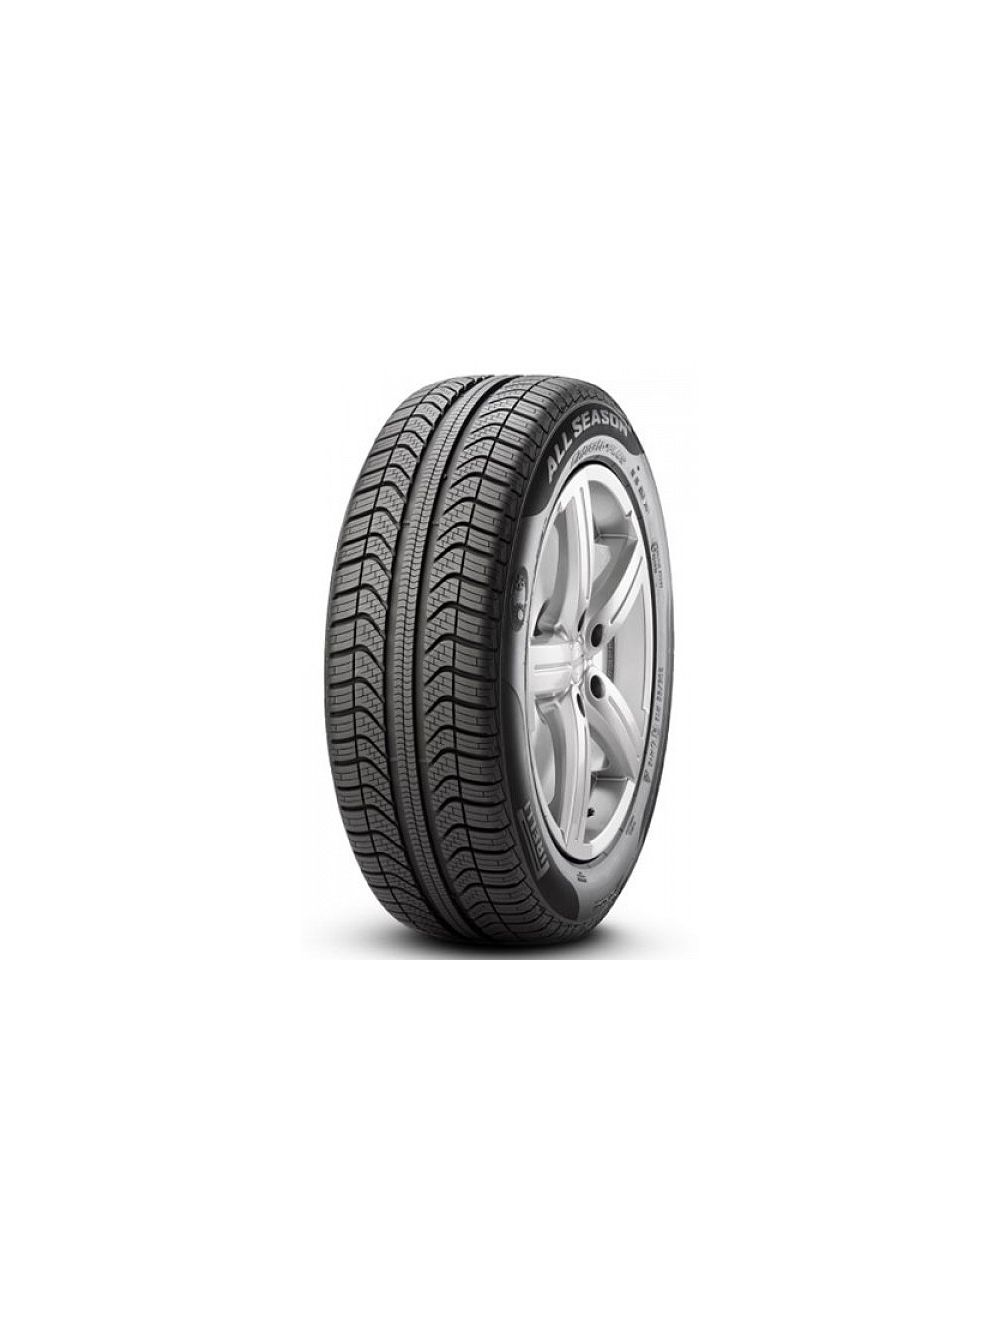 Pirelli 185/60R15 H Cinturato All Season Plus XL Négyévszakos gumi